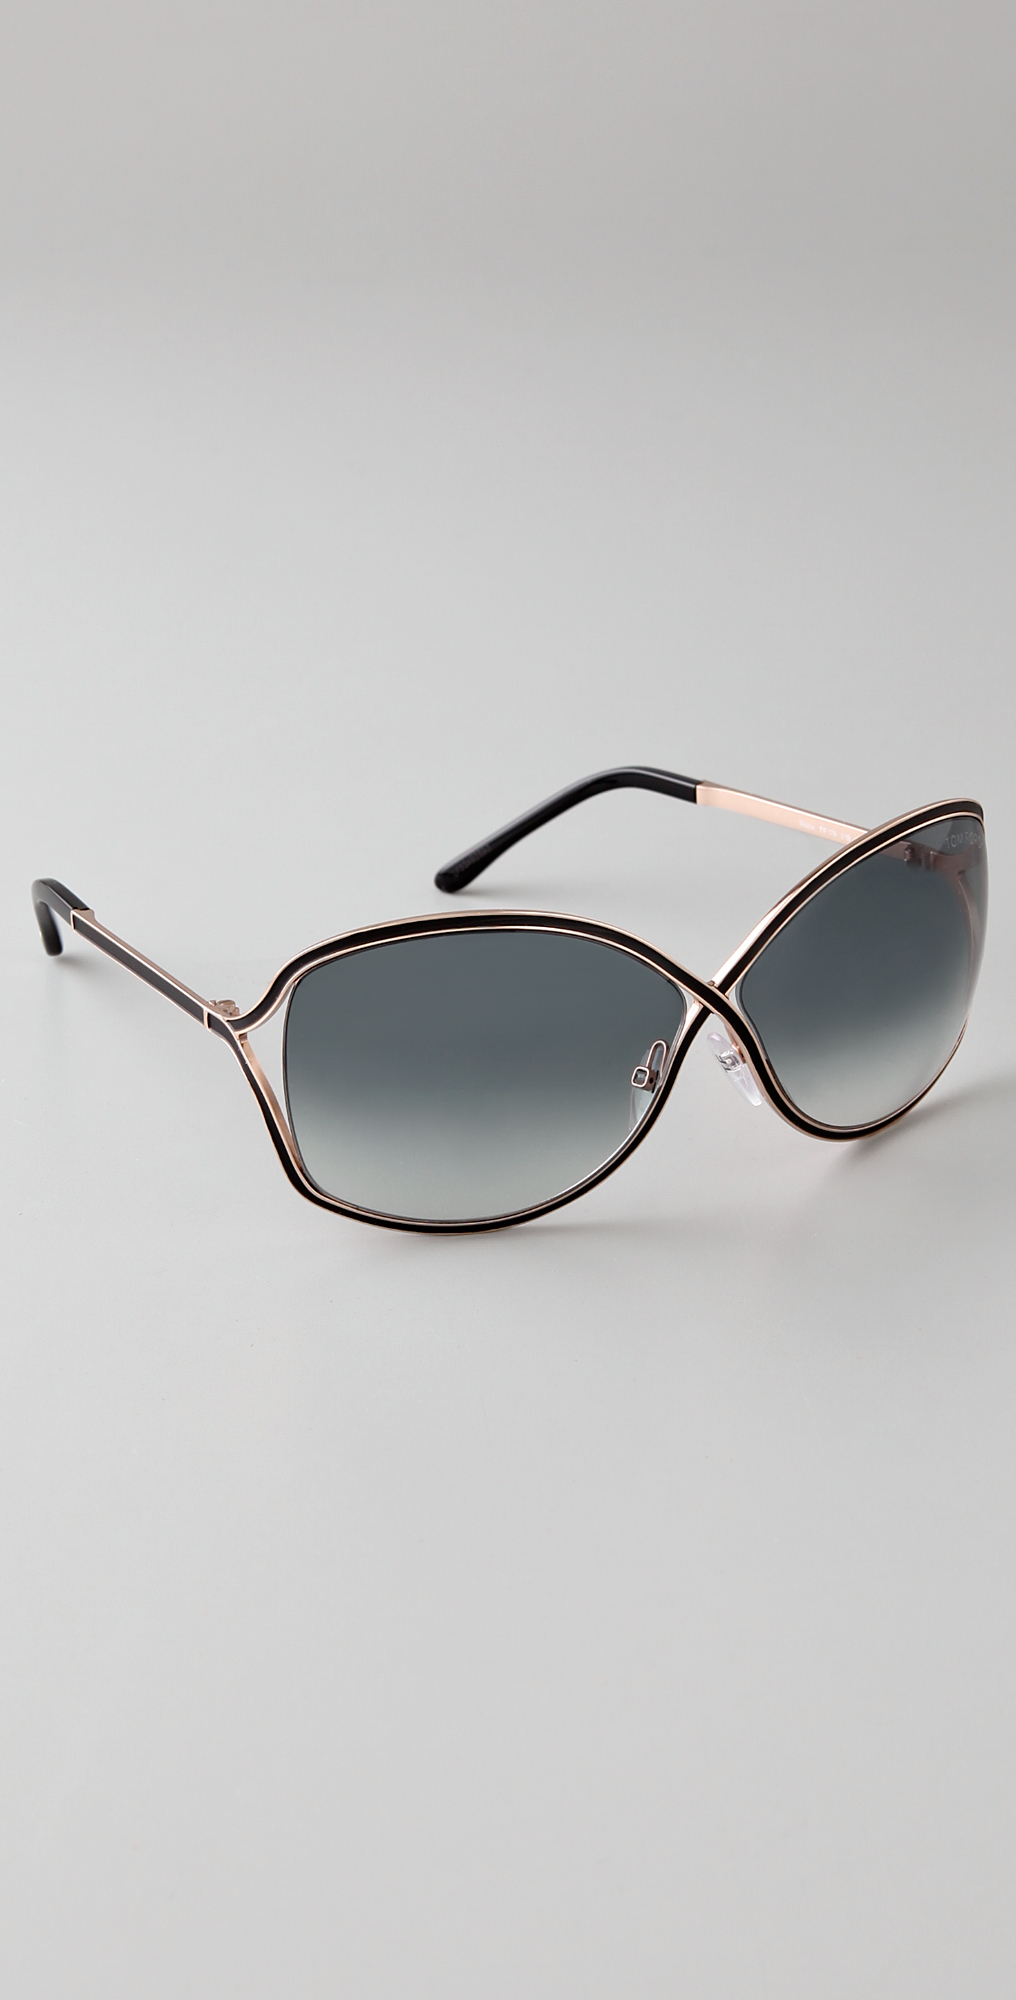 1b89f98bfc Tom Ford Eyewear Rickie Sunglasses